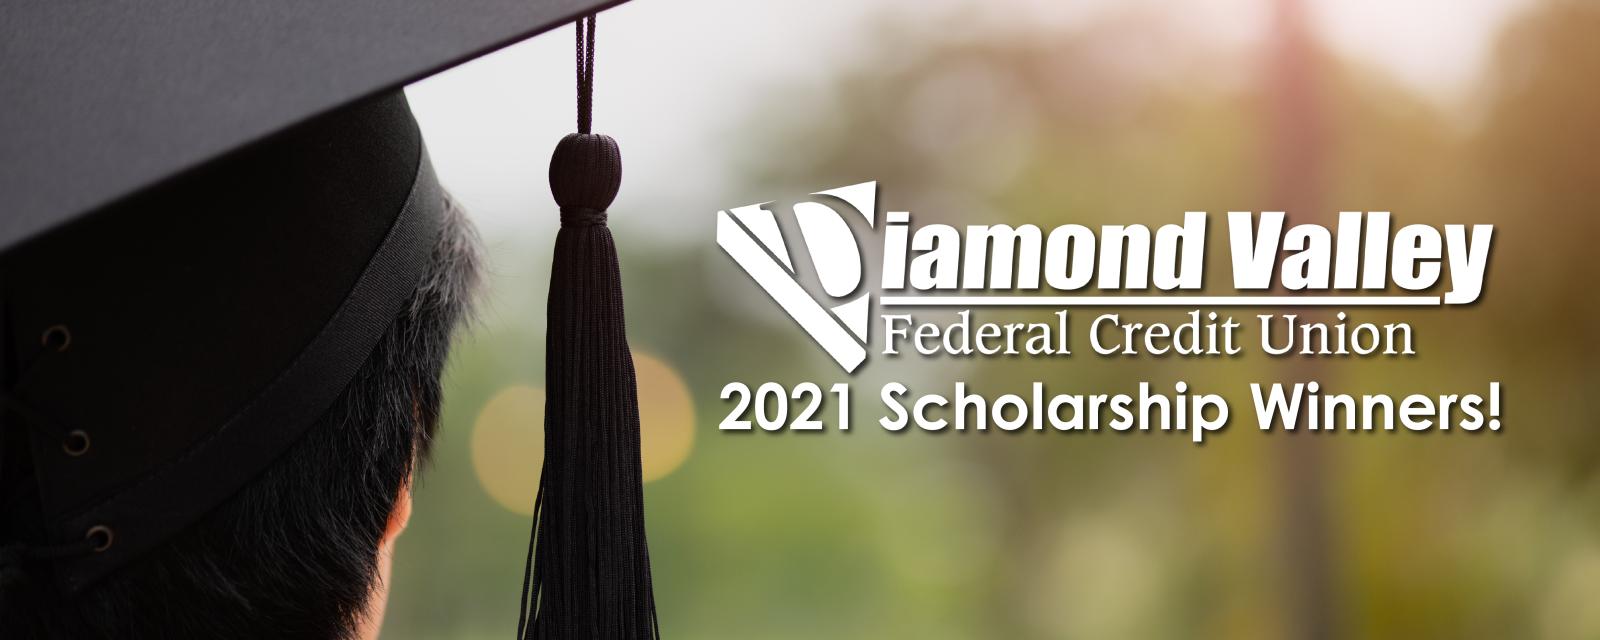 2021 Diamond Valley Federal Credit Union Scholarship Winners!